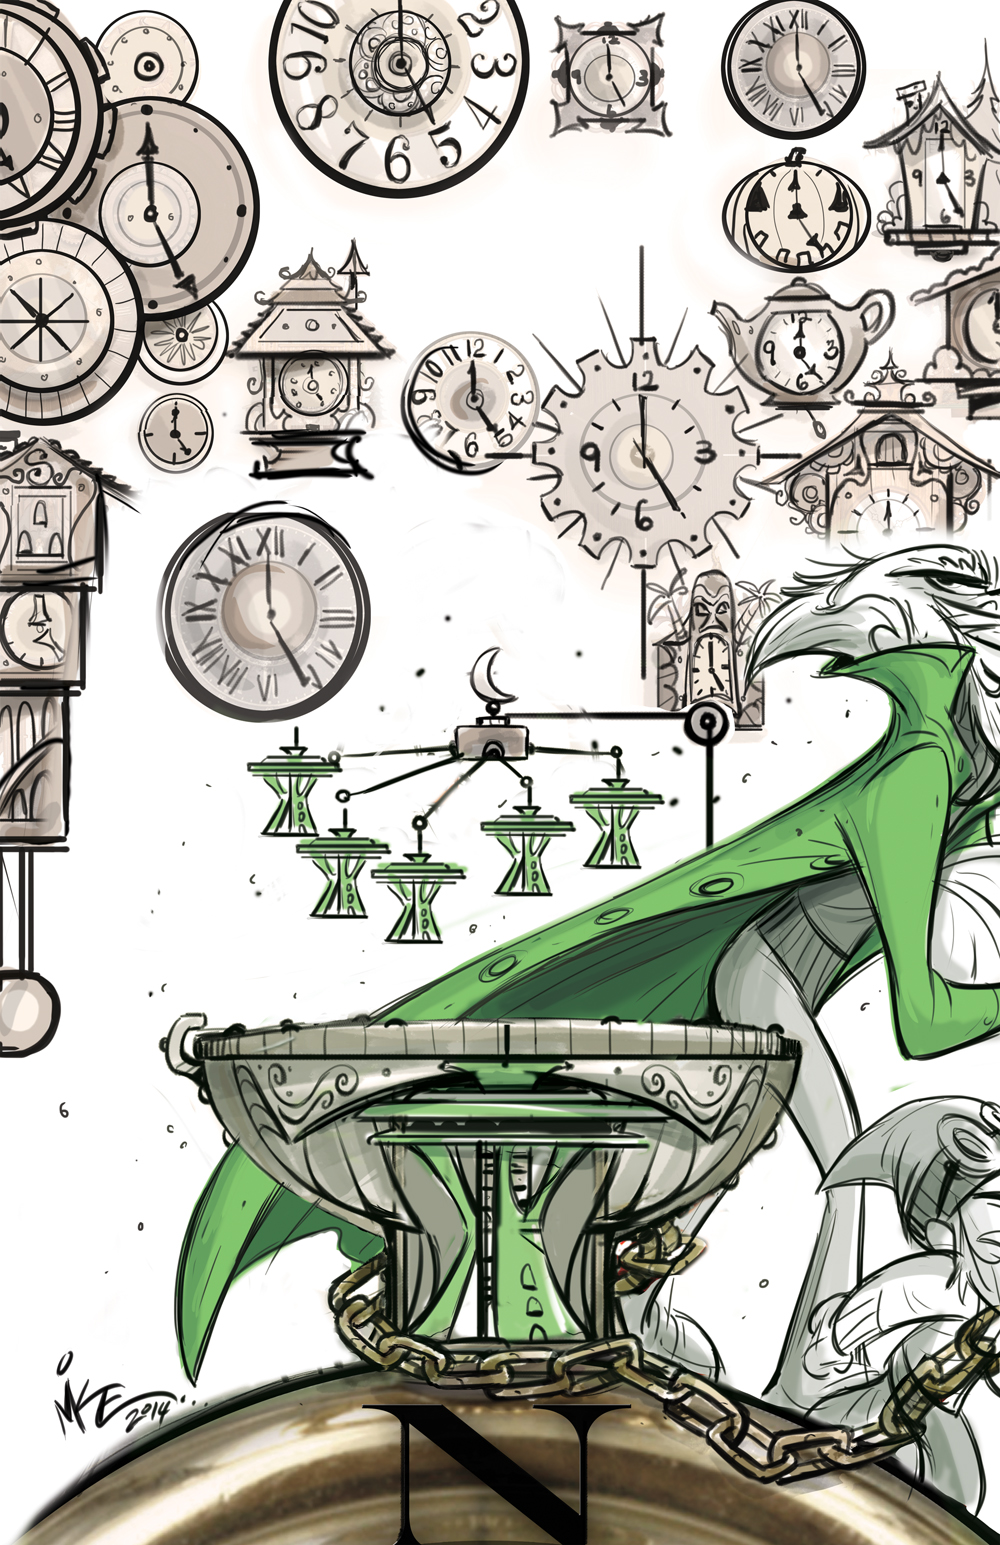 Herobear and the Kid: Saving Time #1 - ECCC